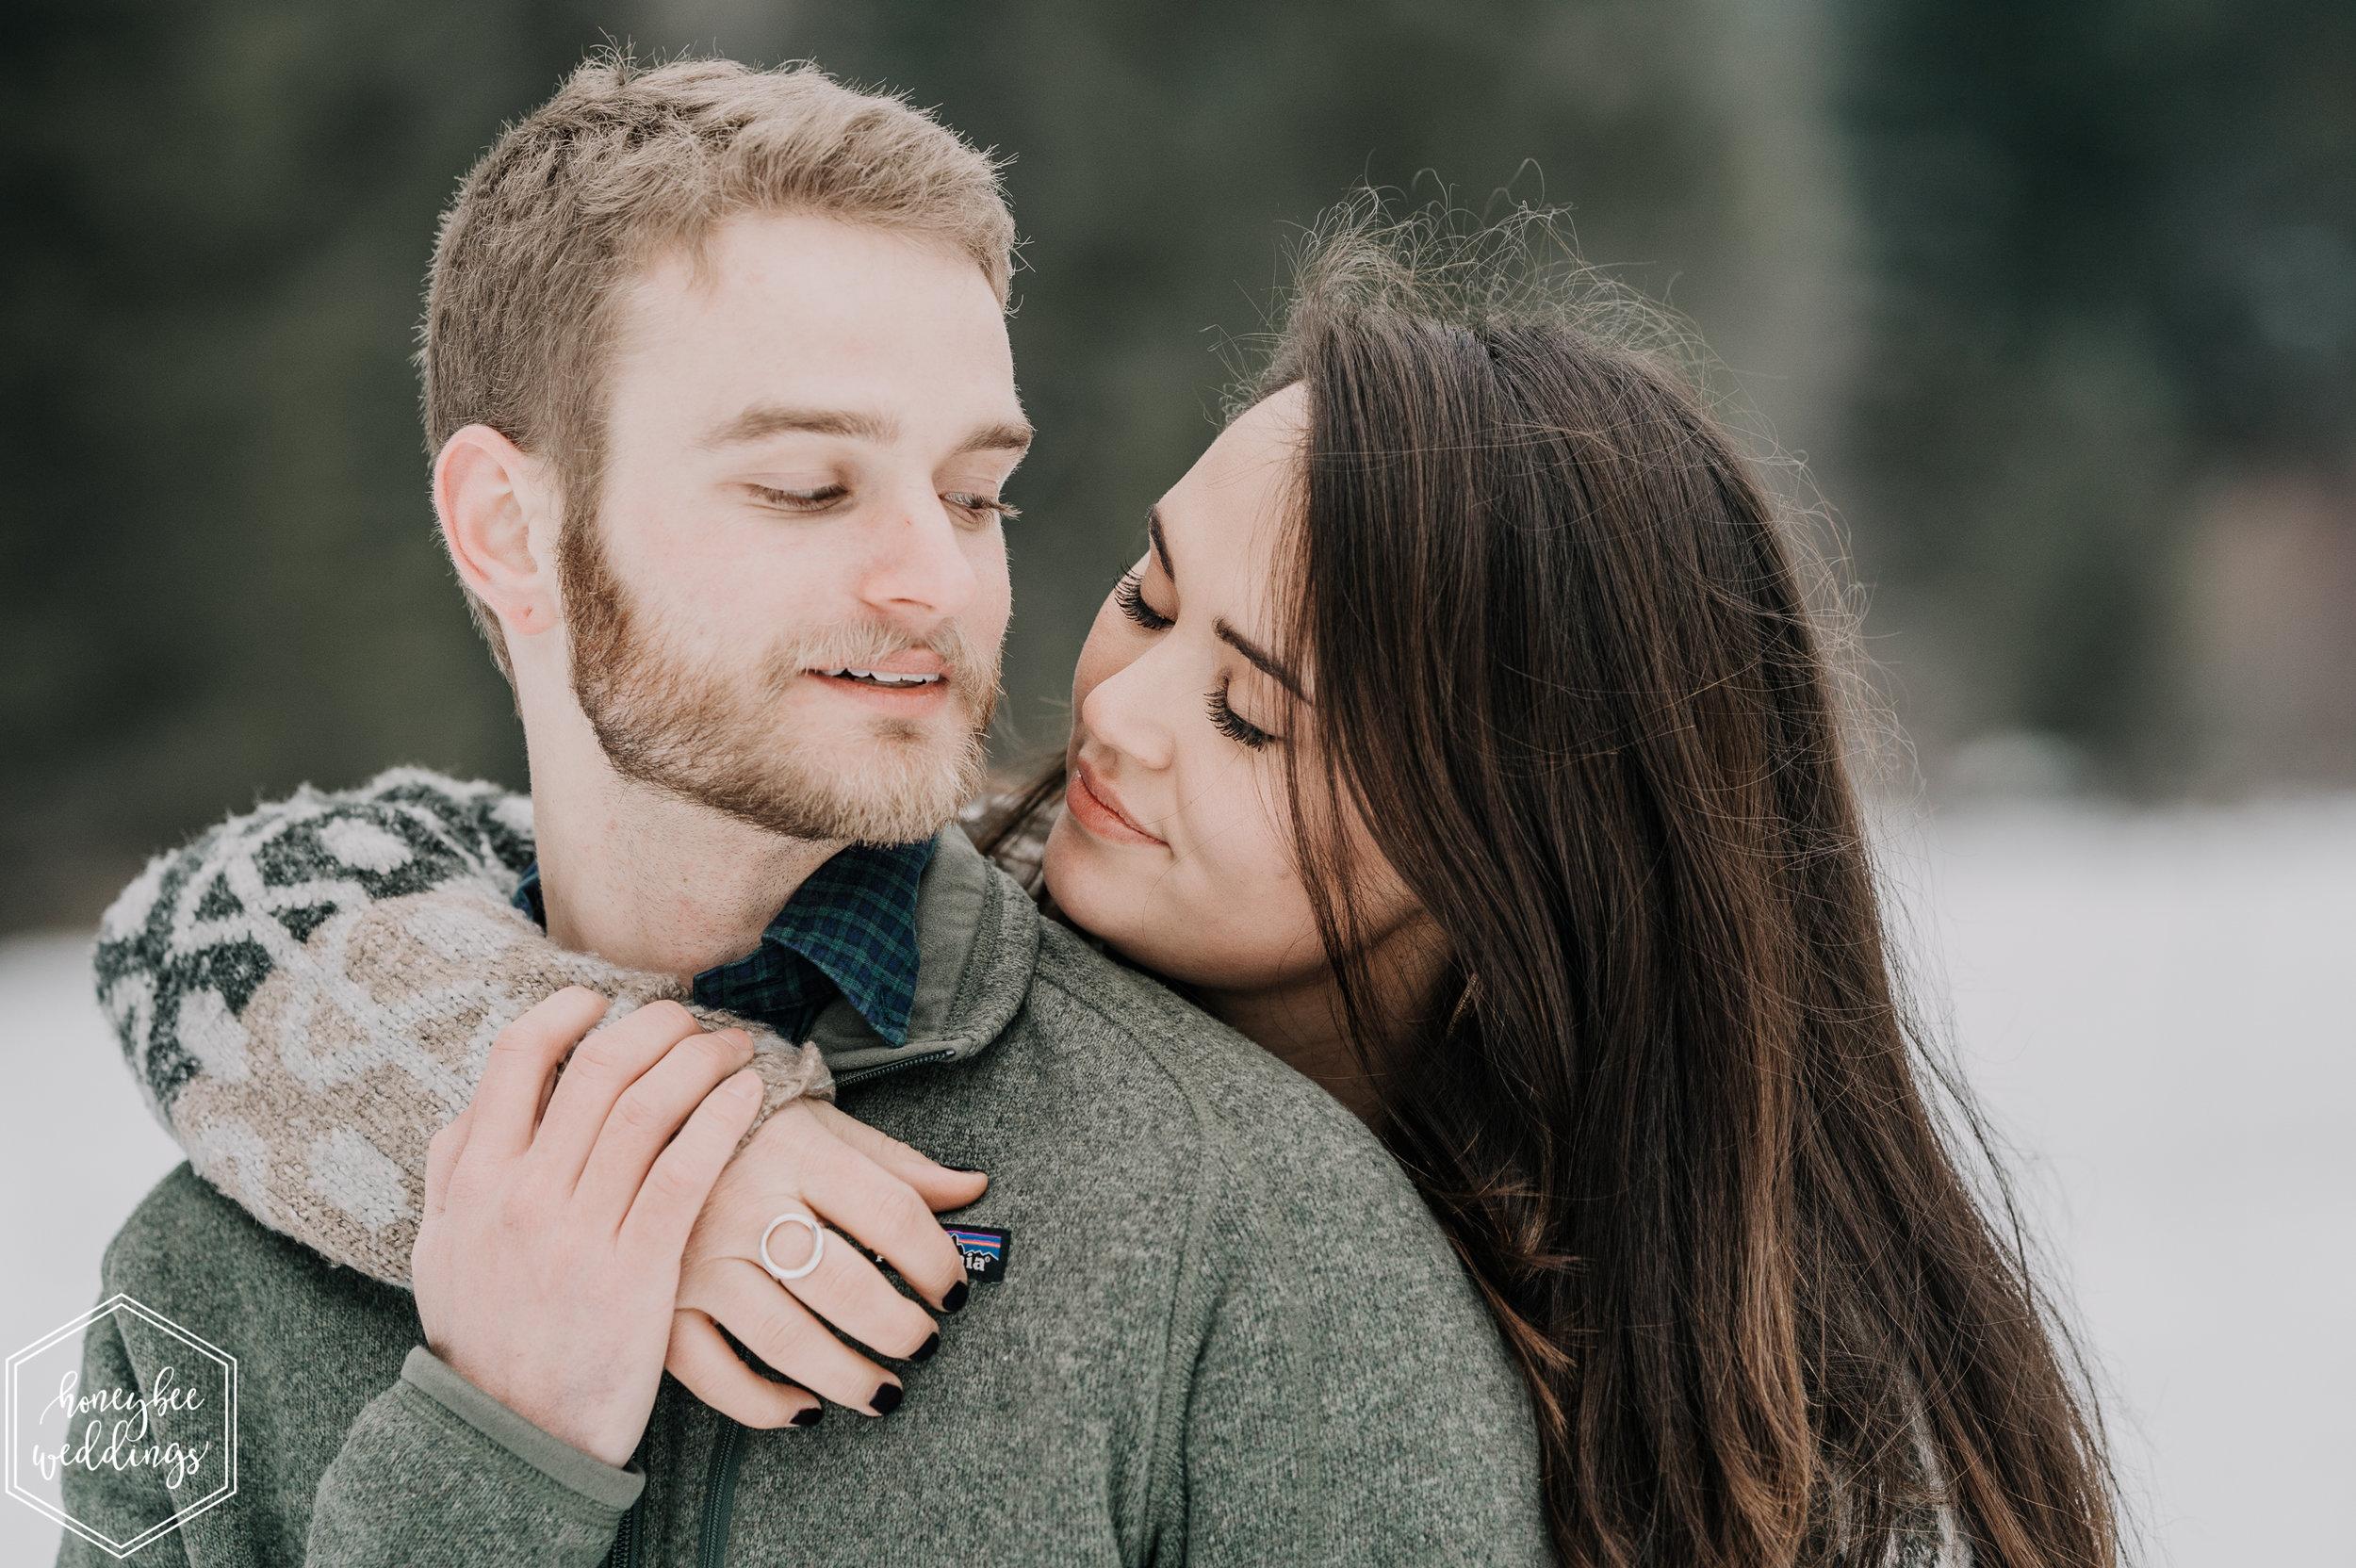 0126Missoula Engagement Session_Rattlesnake Engagement Session_Winter Engagement_Montana Wedding Photographer_Corey & Corey Engagement_December 08, 2018-510.jpg